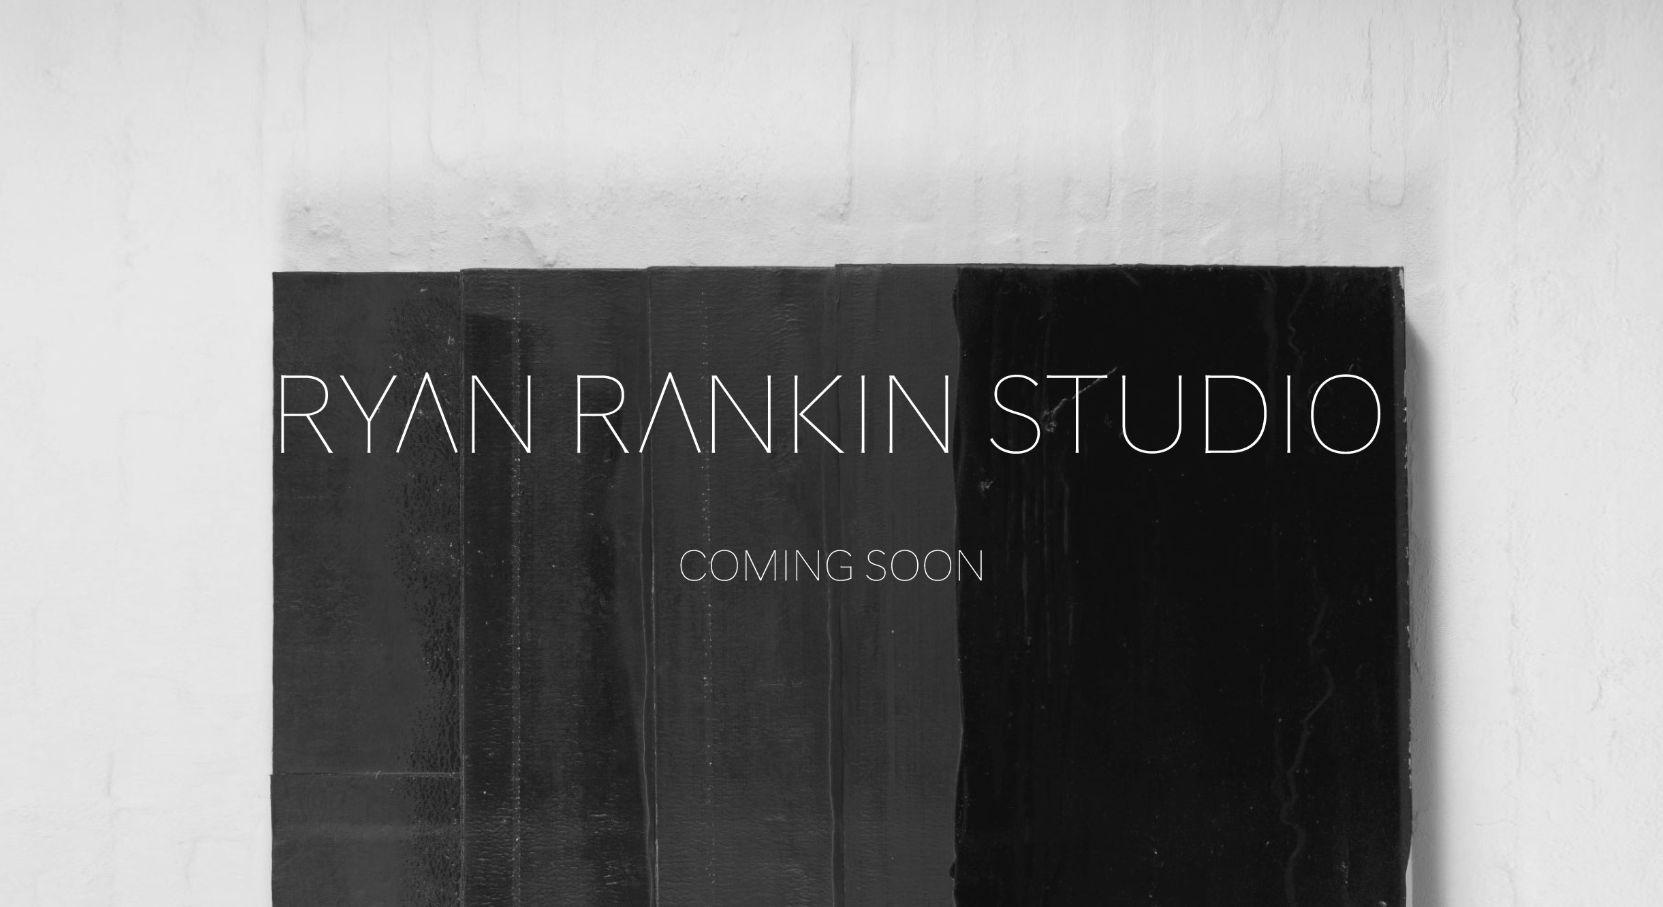 Ryan Rankin Studio Design